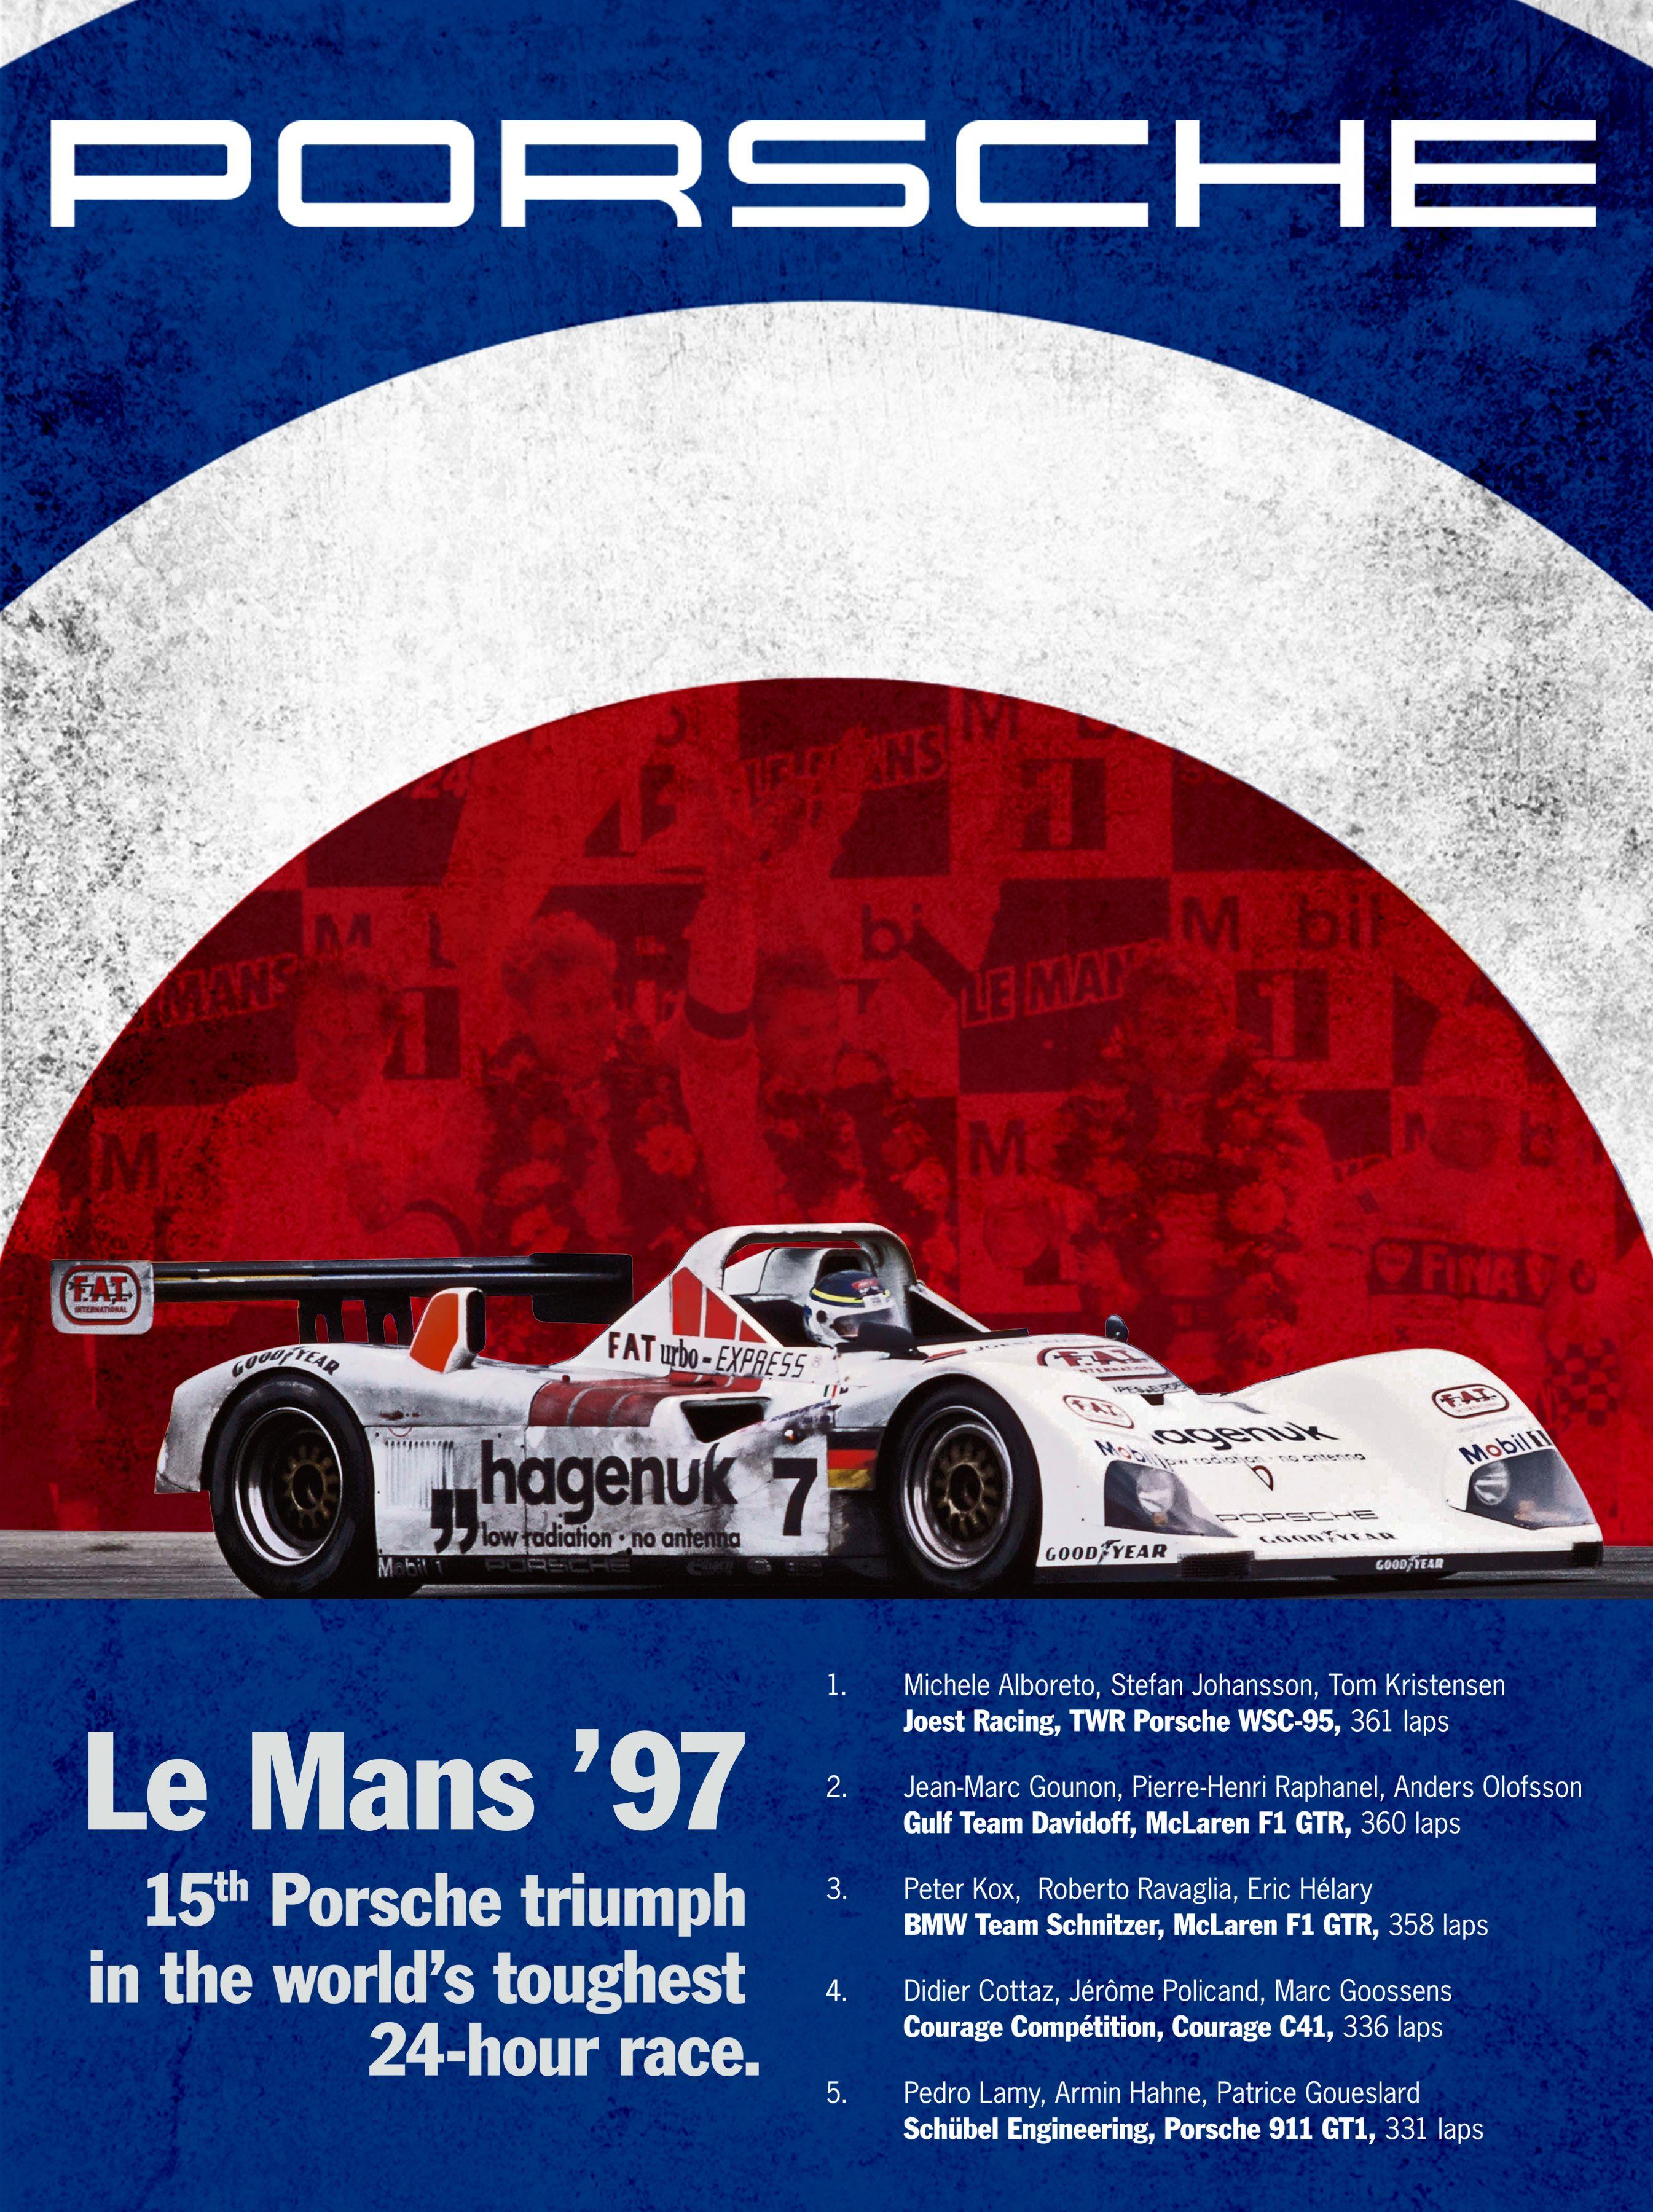 Porsche Le Mans '97 Victory Poster by: Jeff Wolfe (http://pinterest.com/jwolfe81/)